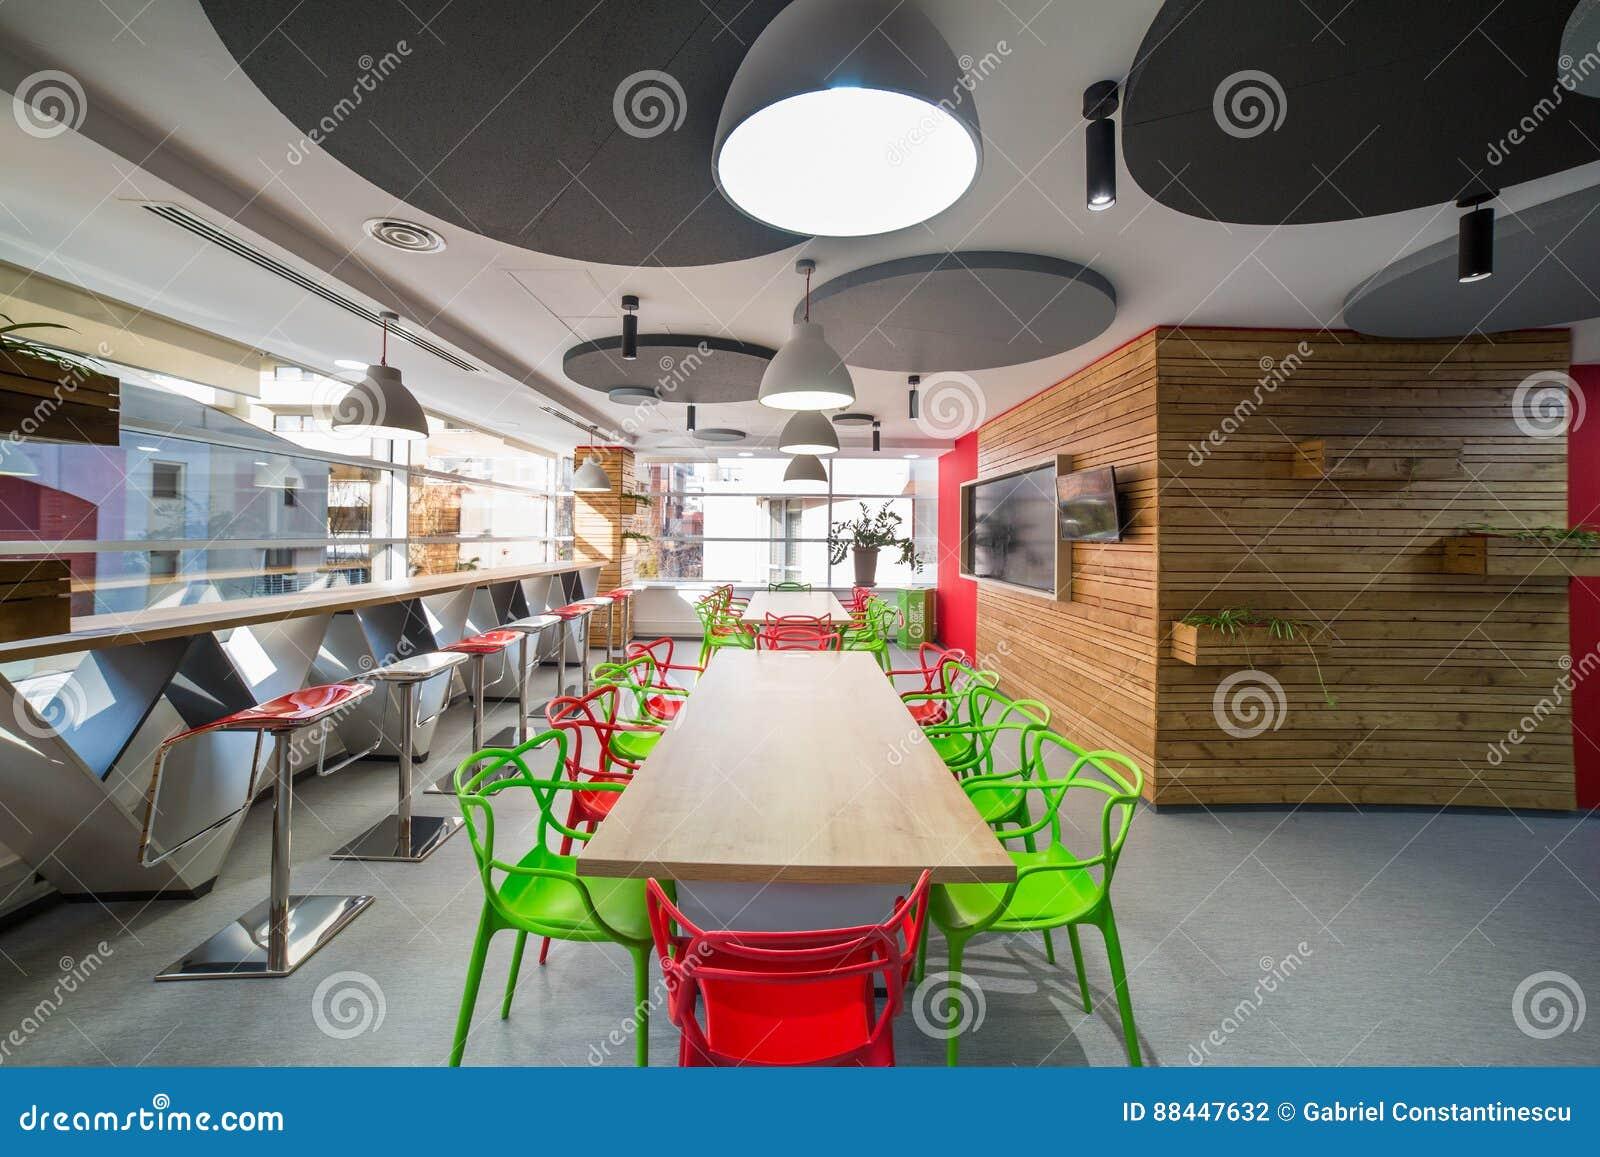 Modern kitchen in office building